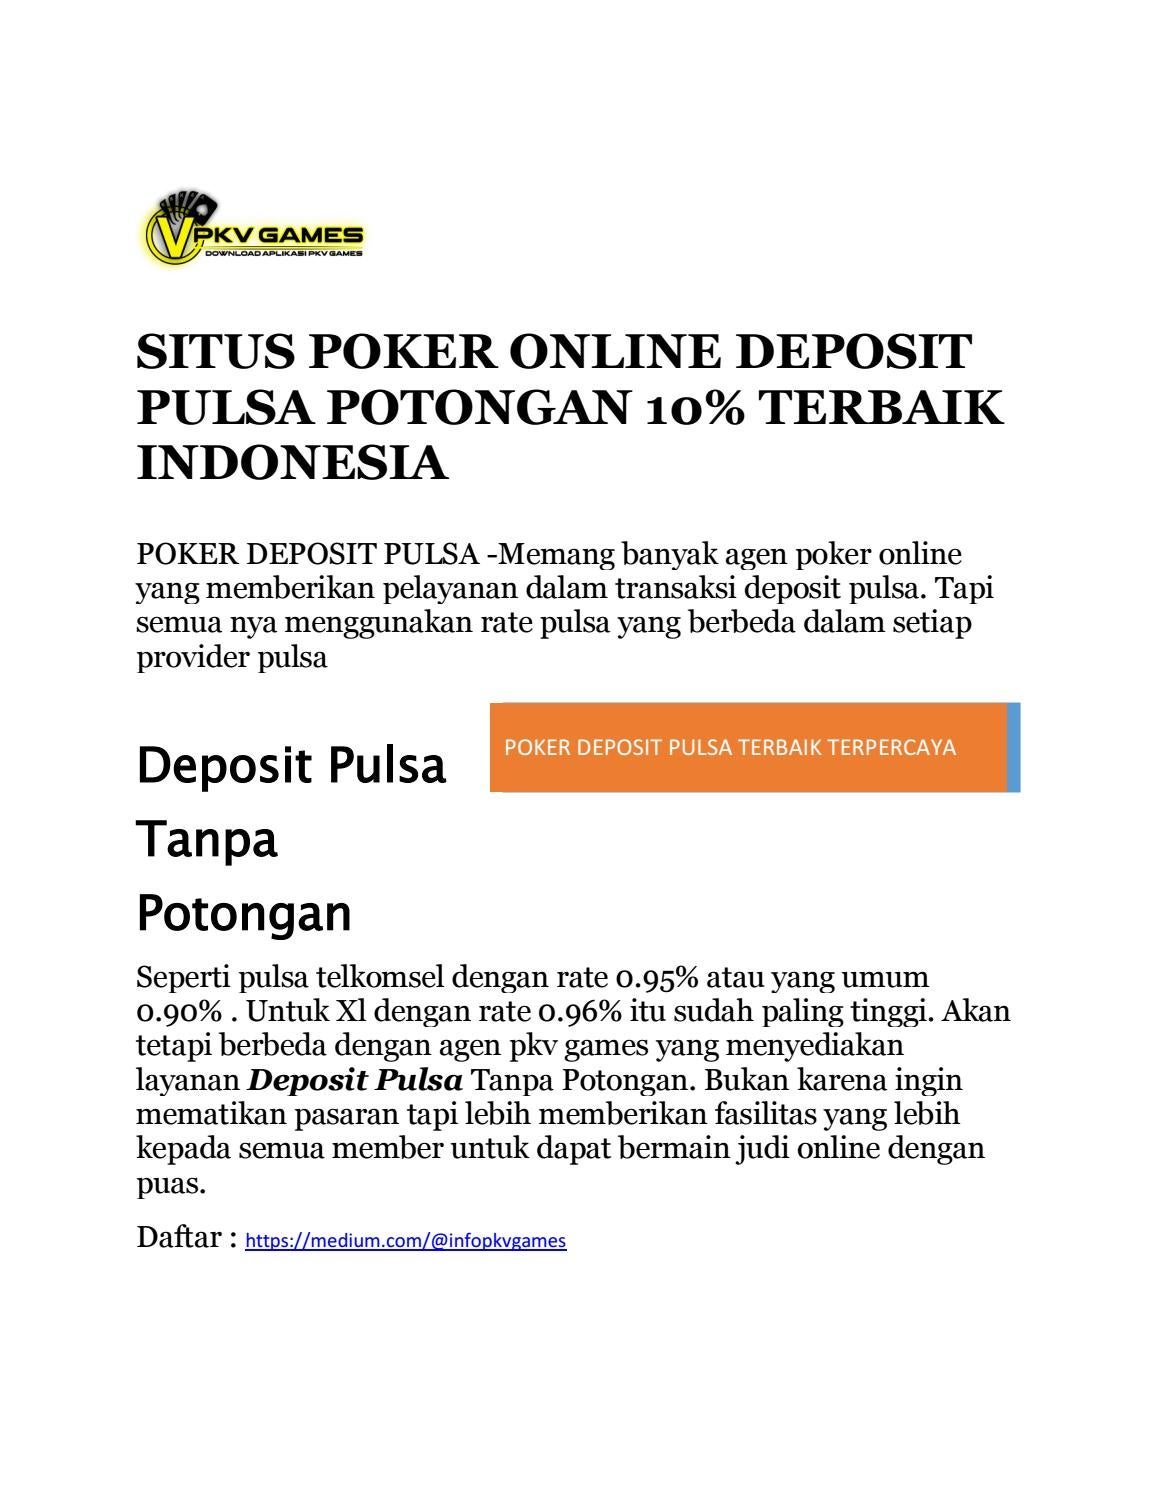 Poker Deposit Pulsa Terbaik Indonesia Pkv Games By Poker Deposit Pulsa Issuu